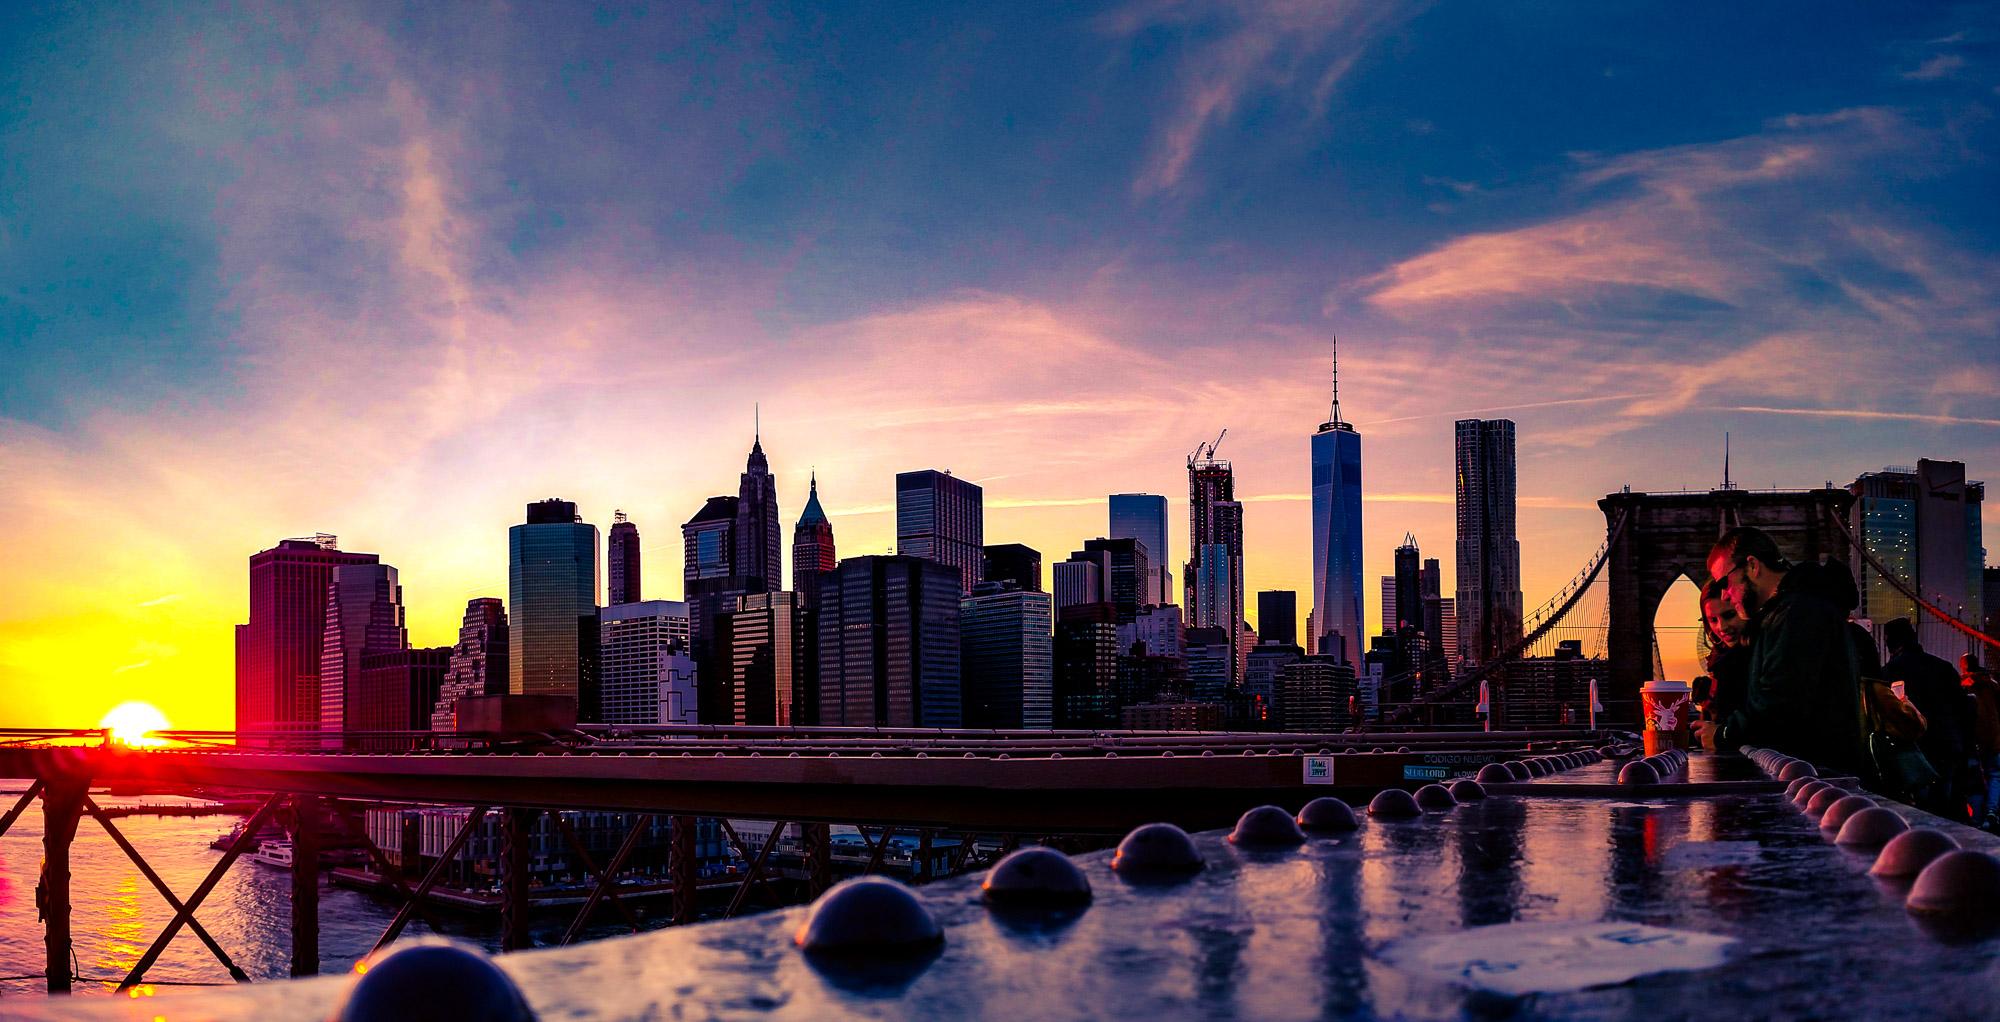 New York Sunset Skyline / / From the Brooklyn Bridge